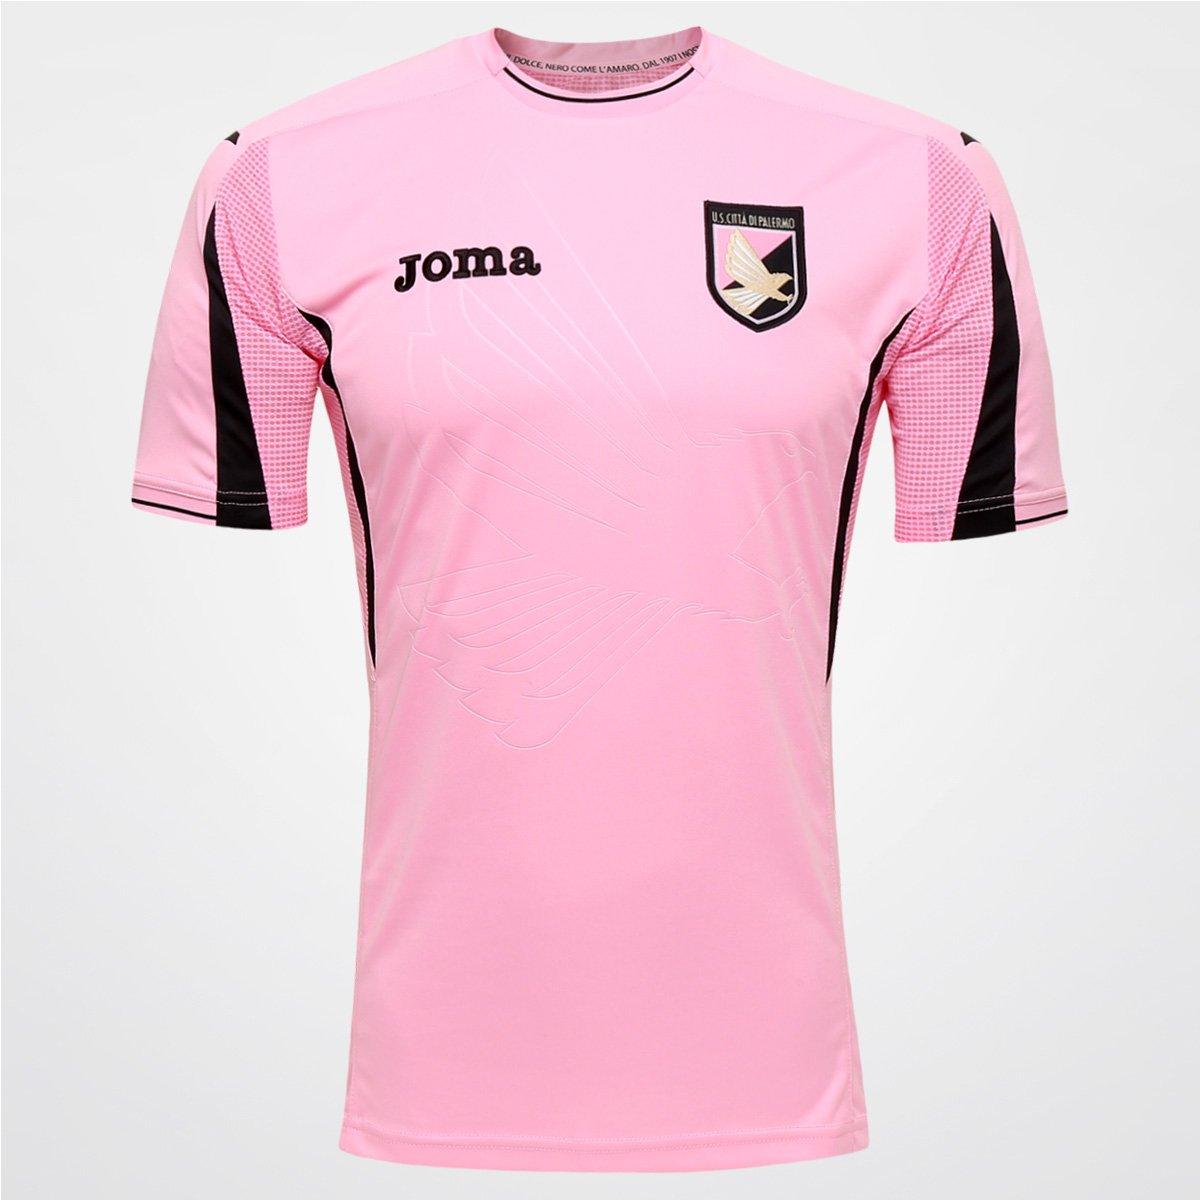 Camisa Palermo Home 15 16 s nº - Torcedor Joma Masculina - Compre Agora  d48e01adfdd82